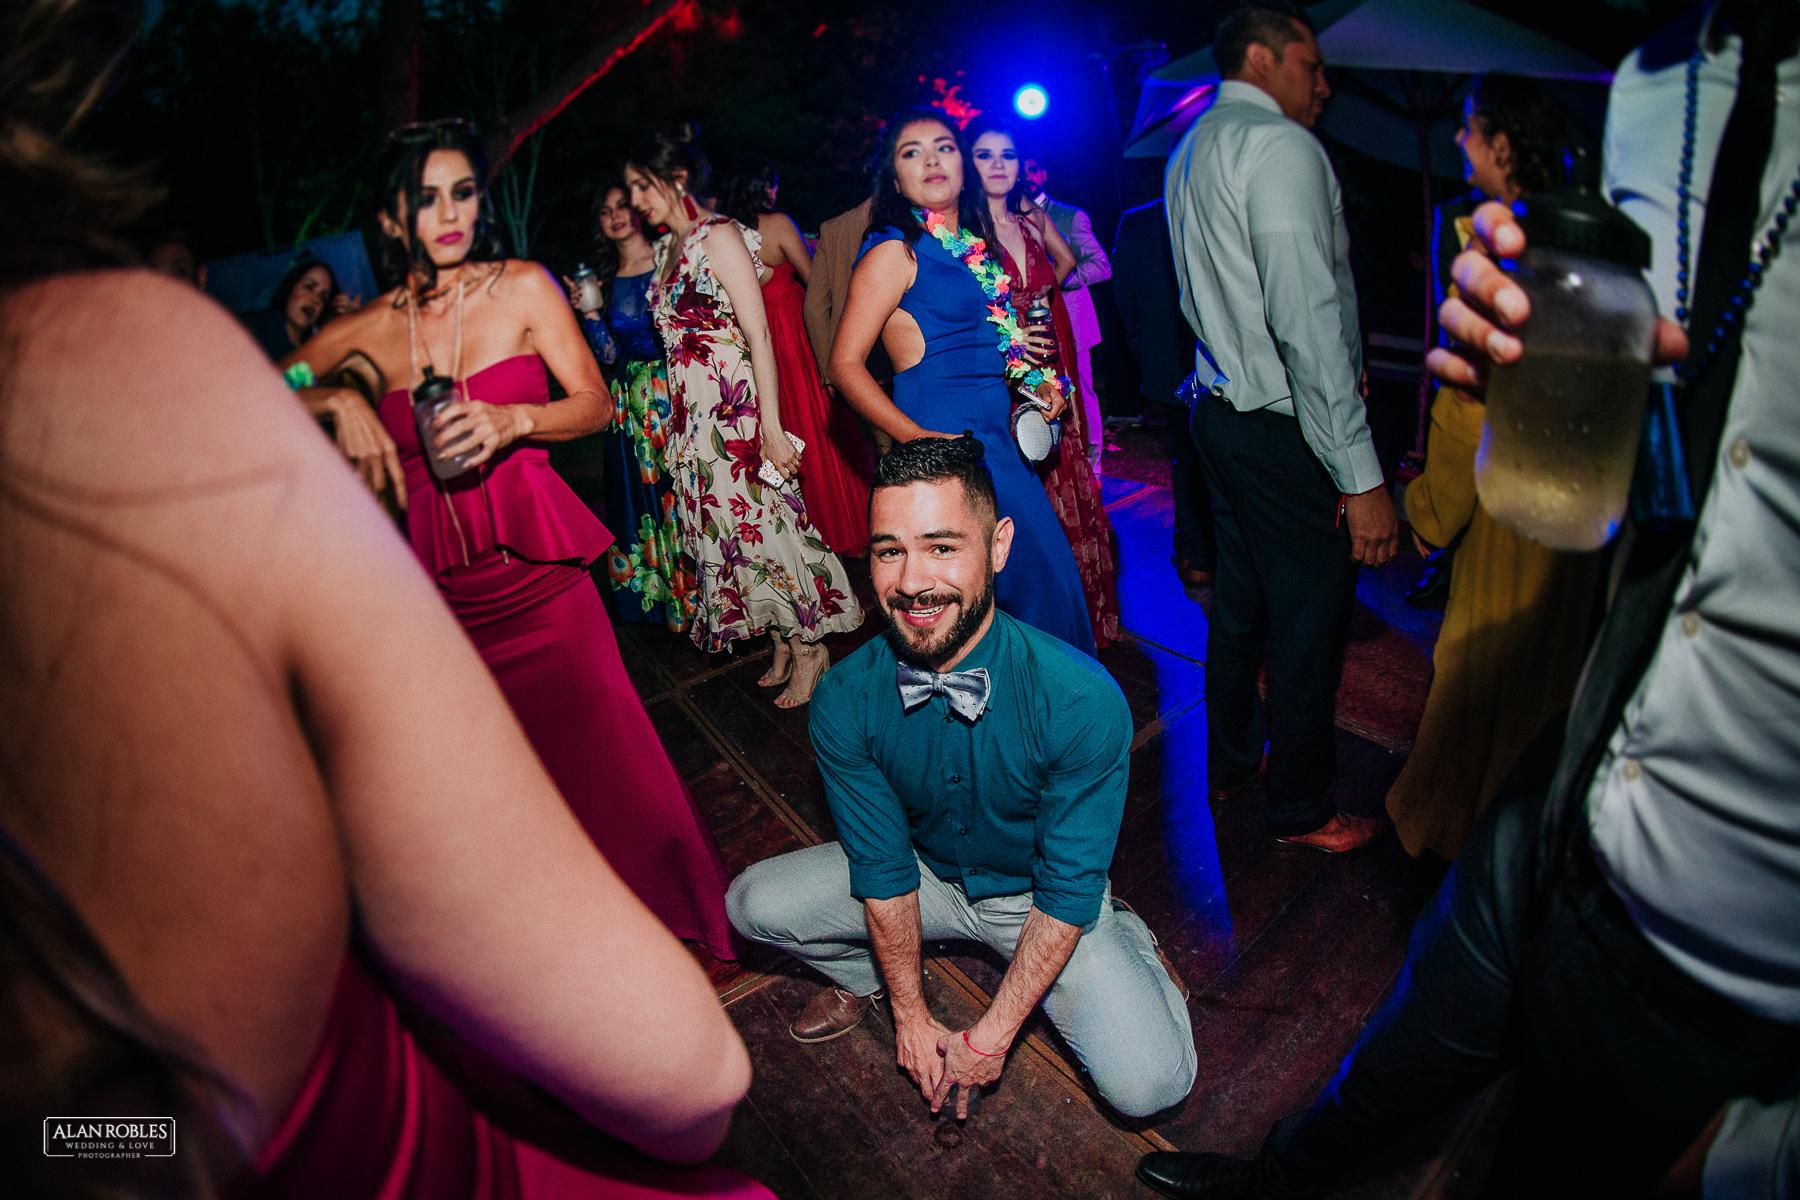 Fotografo de bodas guadalajara Alan Robles - Pinare terraza bistro 60